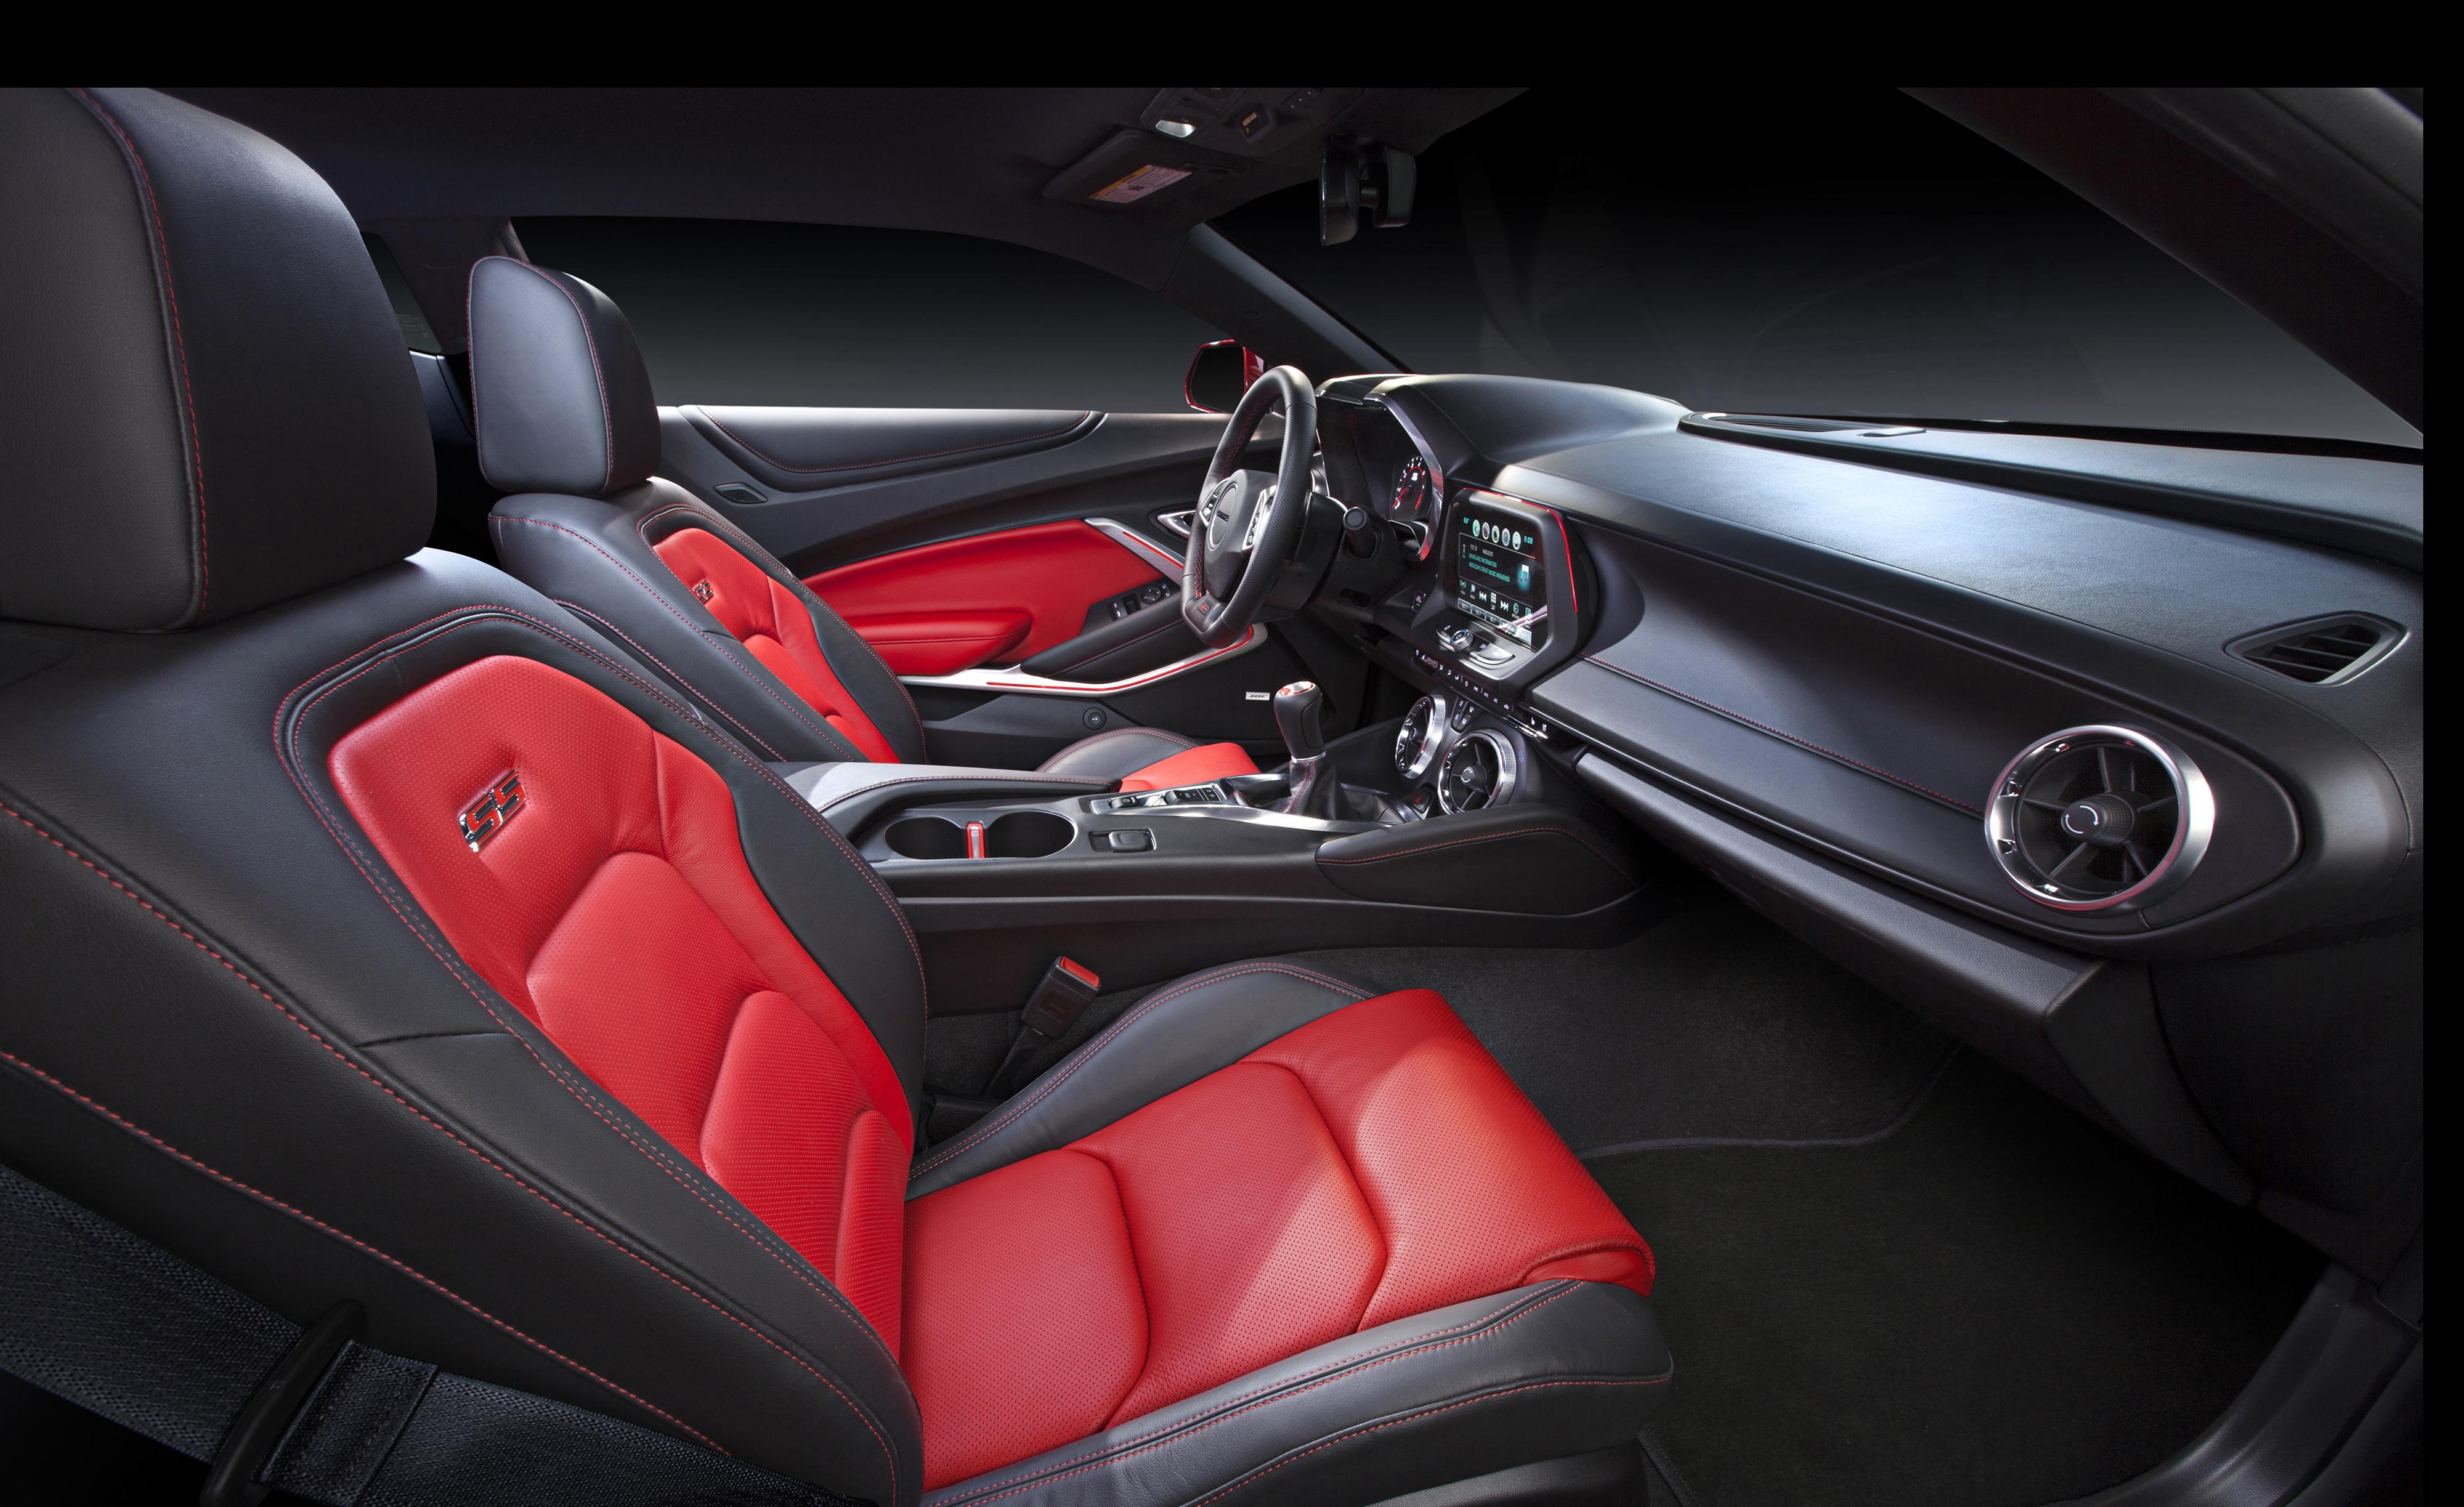 Look Inside The New 2016 Camaro